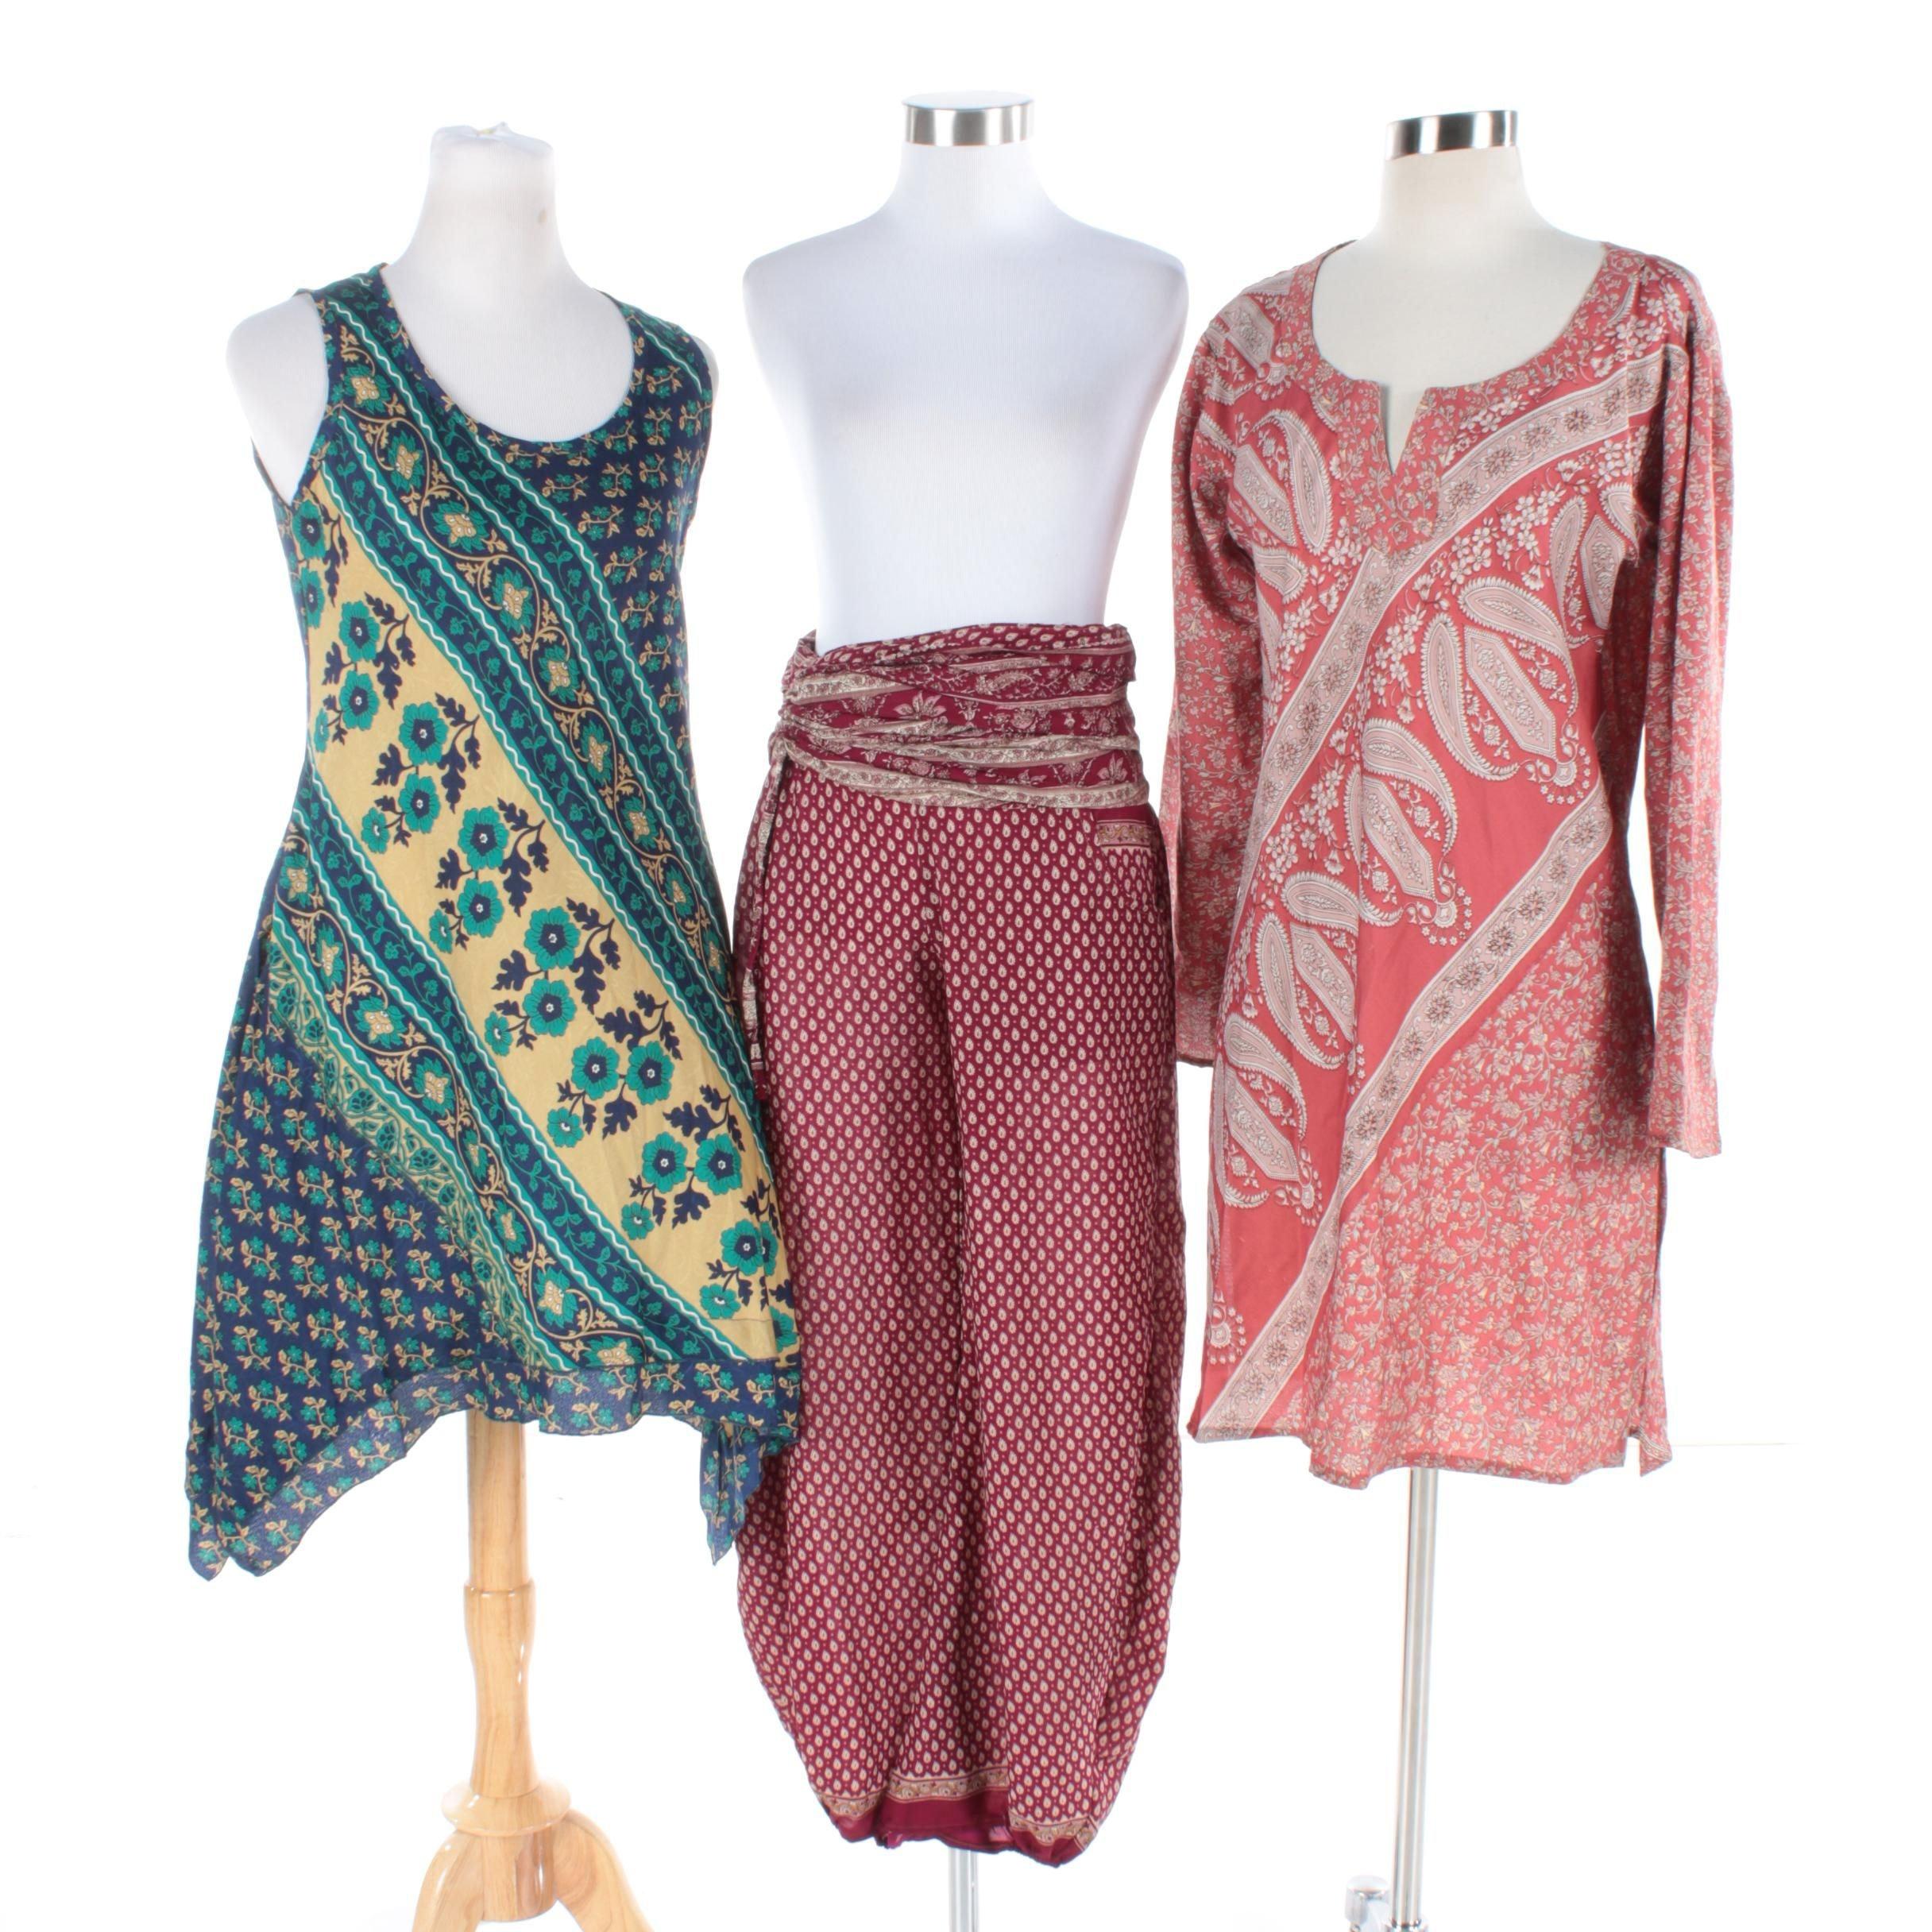 Vintage Sari One of Kind Clothing Items